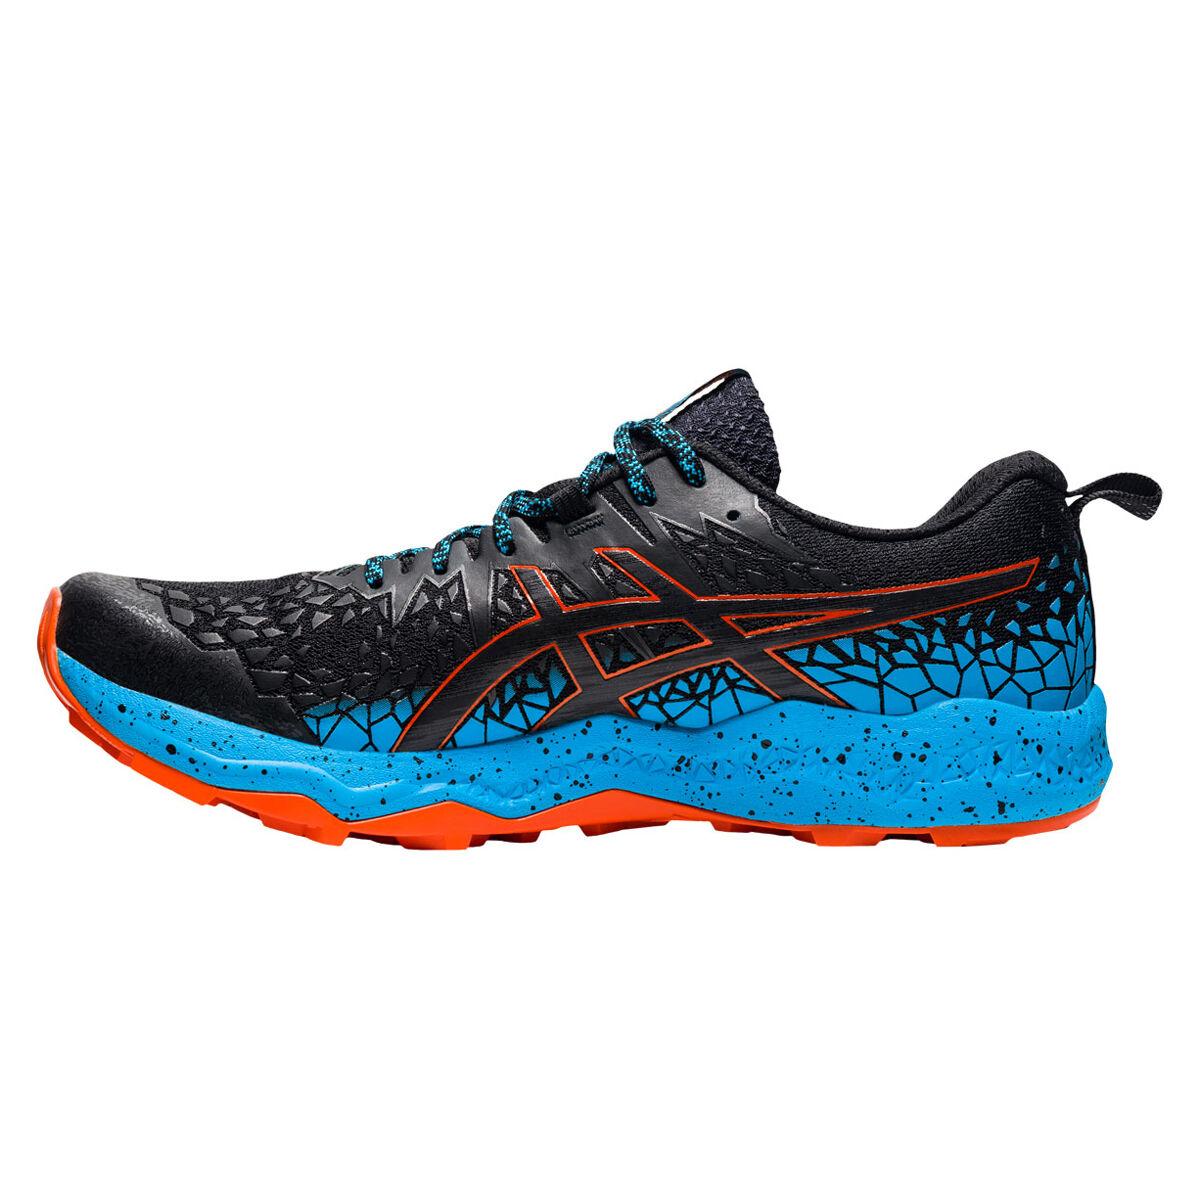 Asics Fuji Trabuco Lyte Mens Trail Running Shoes Black/Aqua US ...